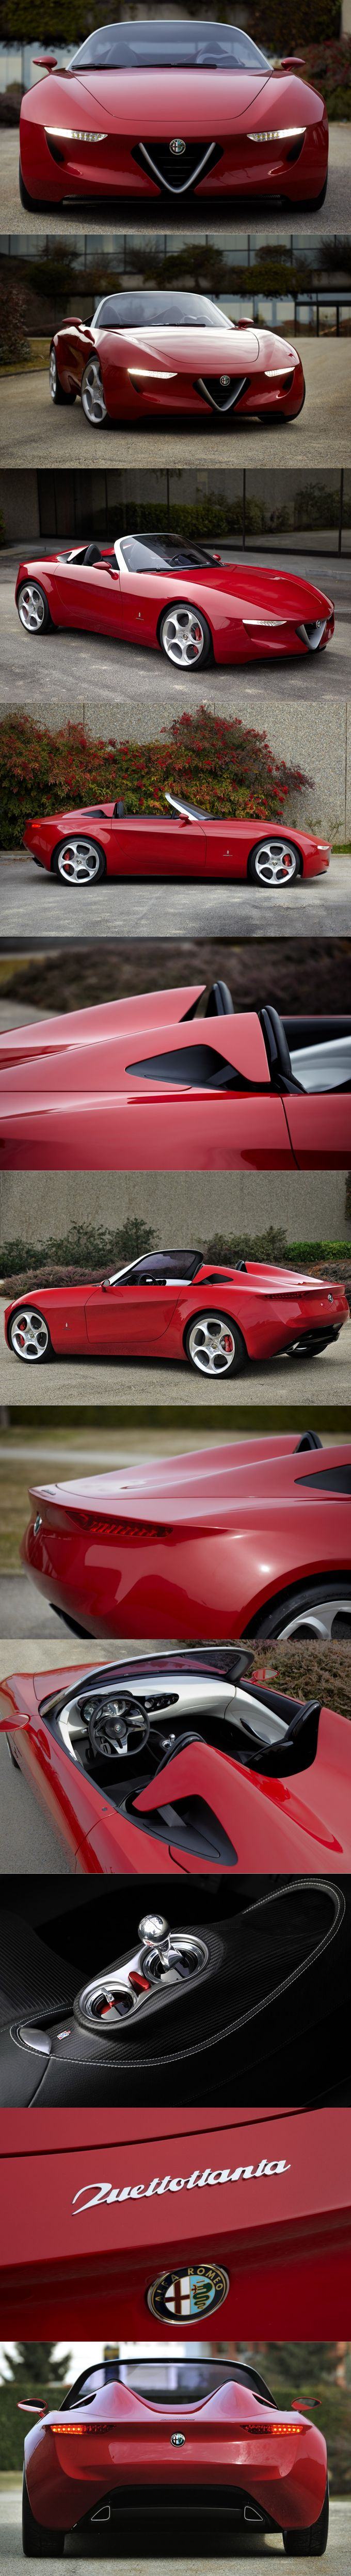 2010 Alfa Romeo 2uettottante / Duetto tribute / Pininfarina 80th anniversay / Alfa Romeo centenary / Italy Belgium / red / concept / Lowie Vermeersch